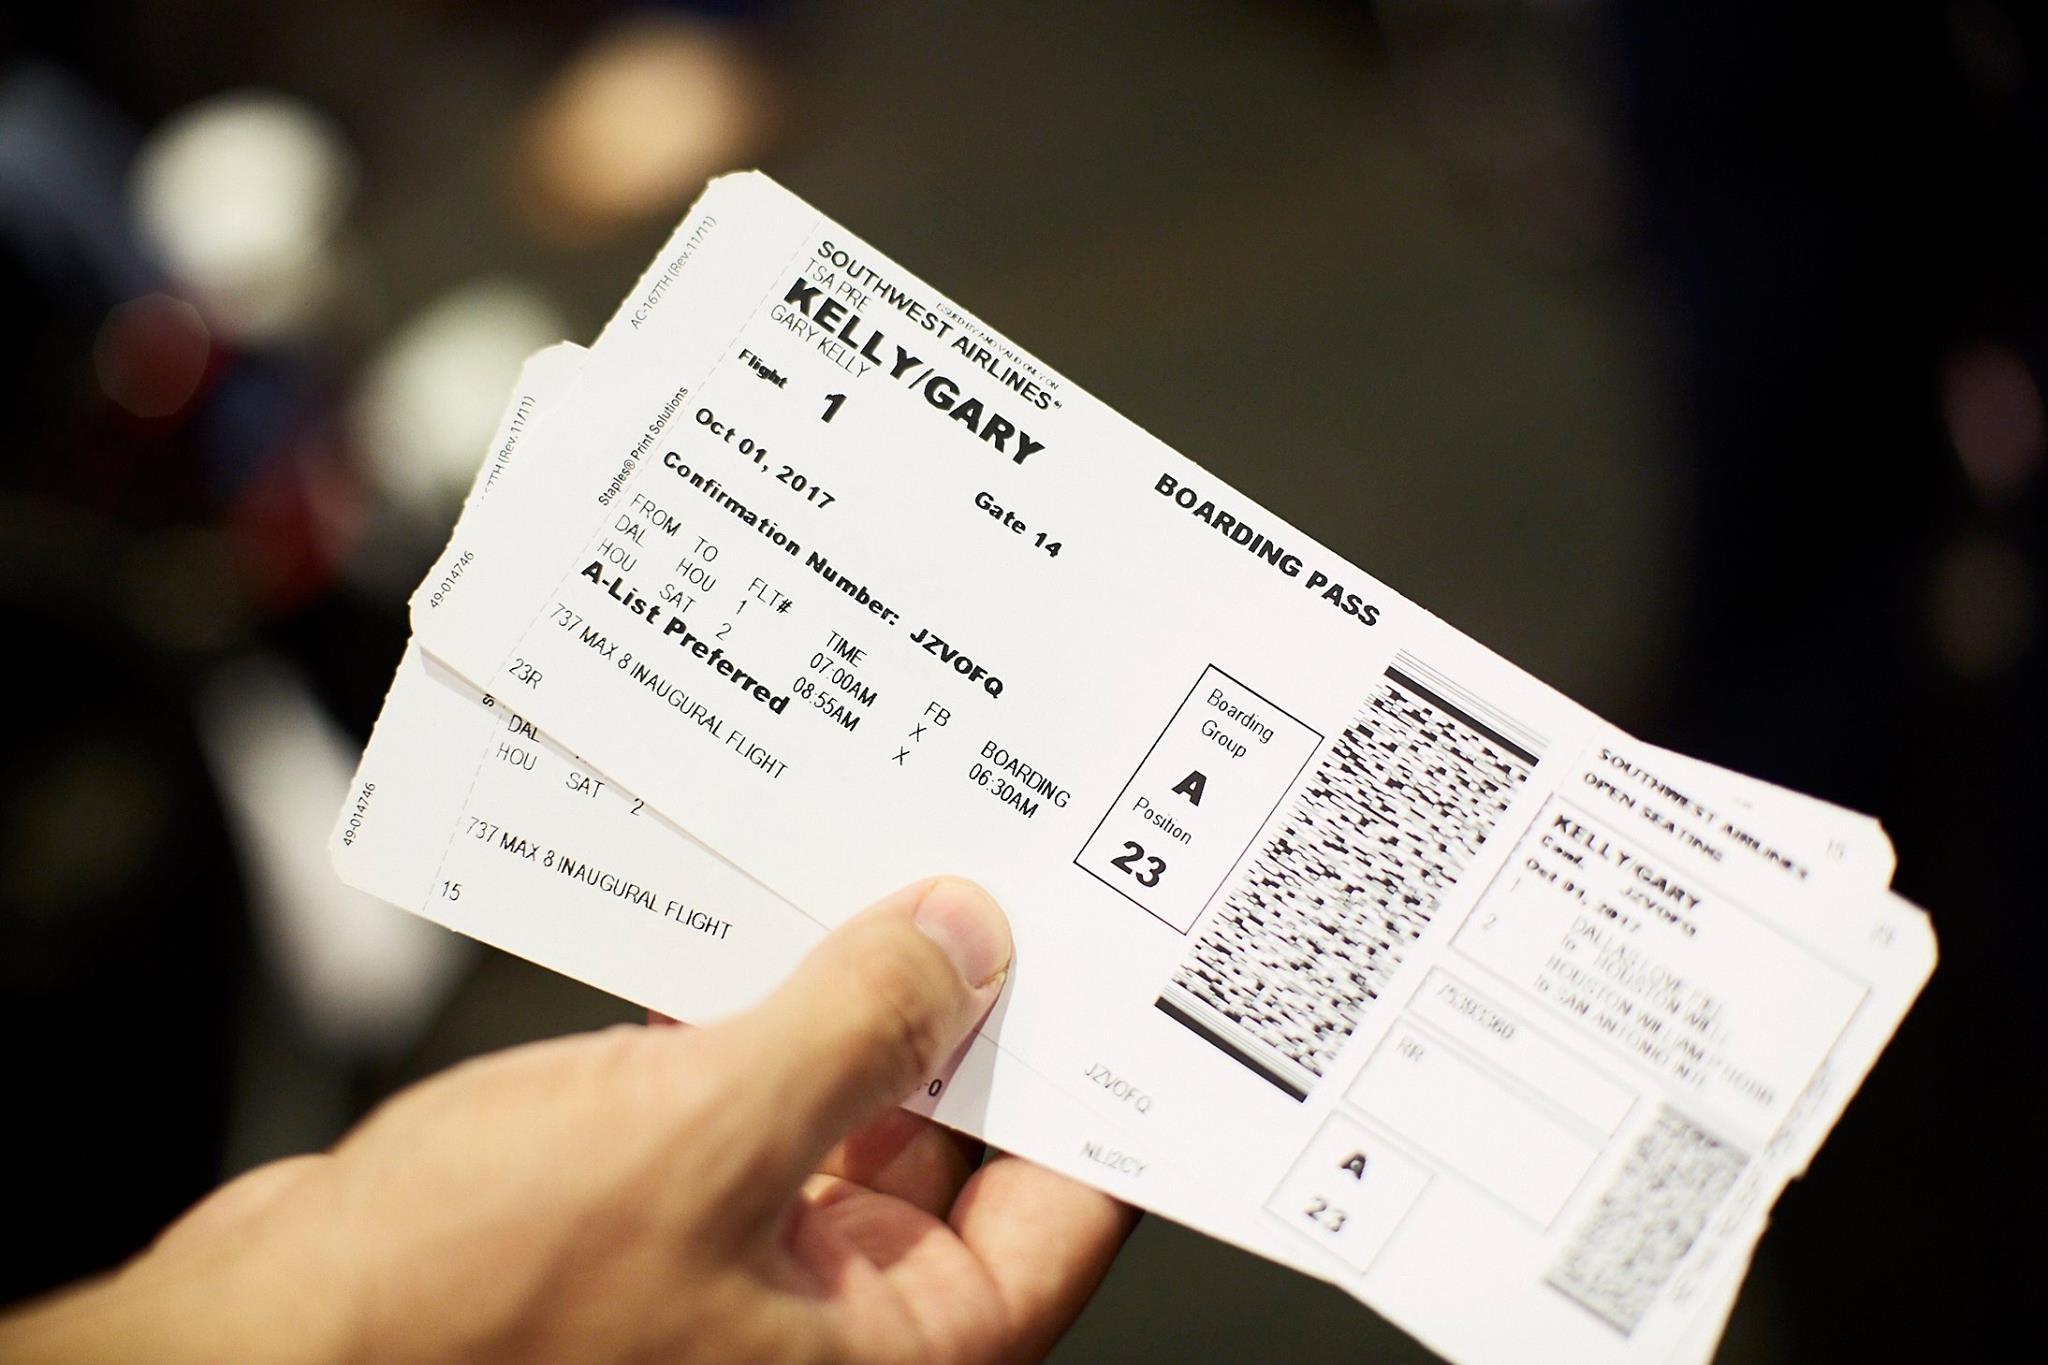 southwest airlines a-list status rewards – Southwest airline tickets